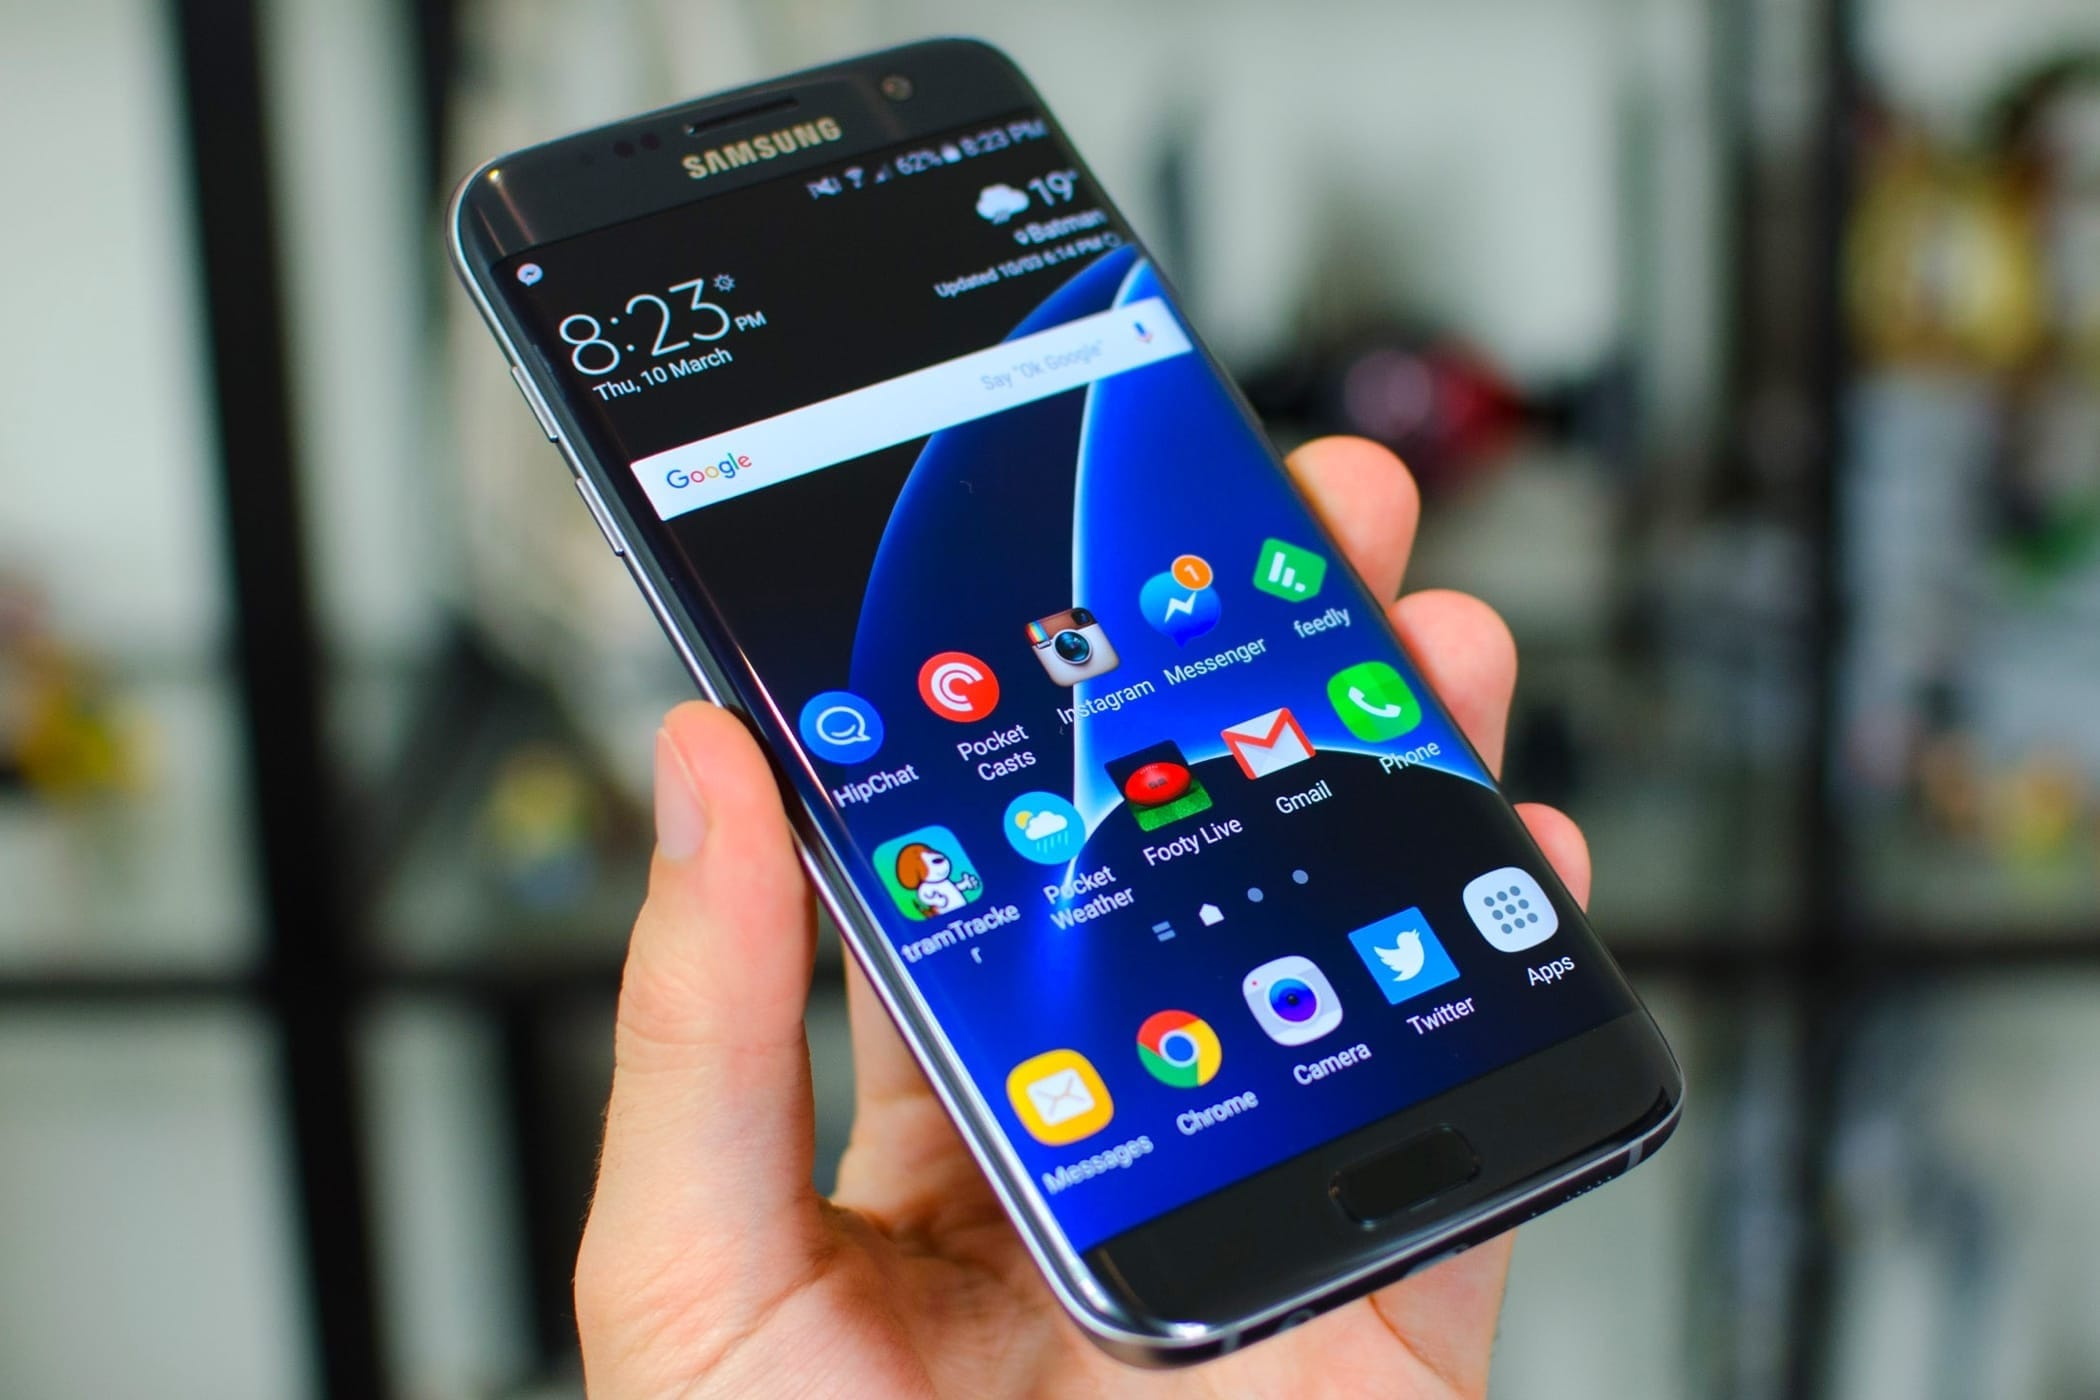 Специалисты поведали, чем OnePlus 6 лучше iPhone X и Самсунг Galaxy S9